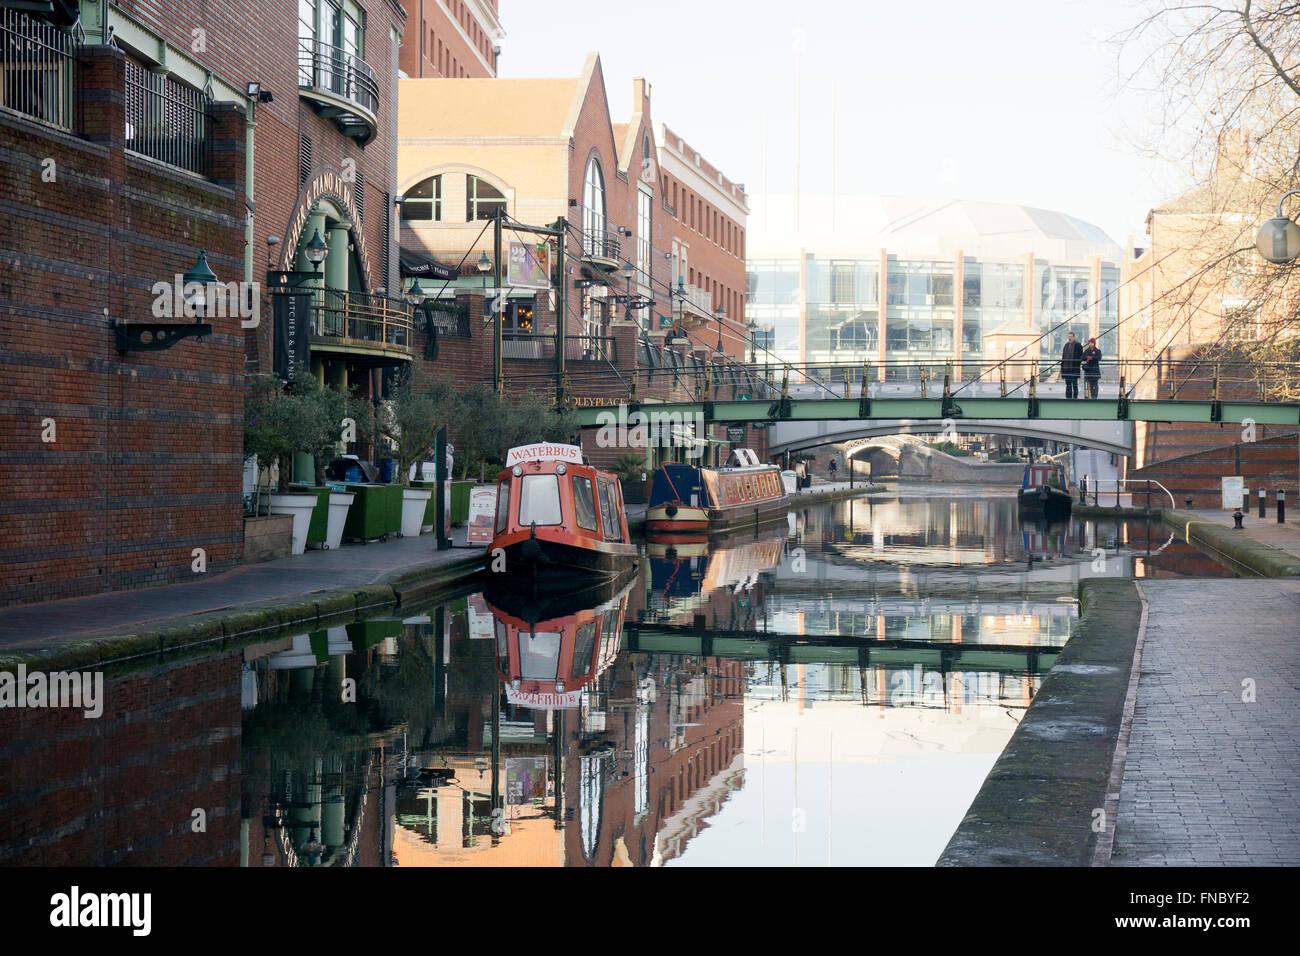 Narrowboats on the canal at Brindley Place Birmingham, England, UK Stock Photo